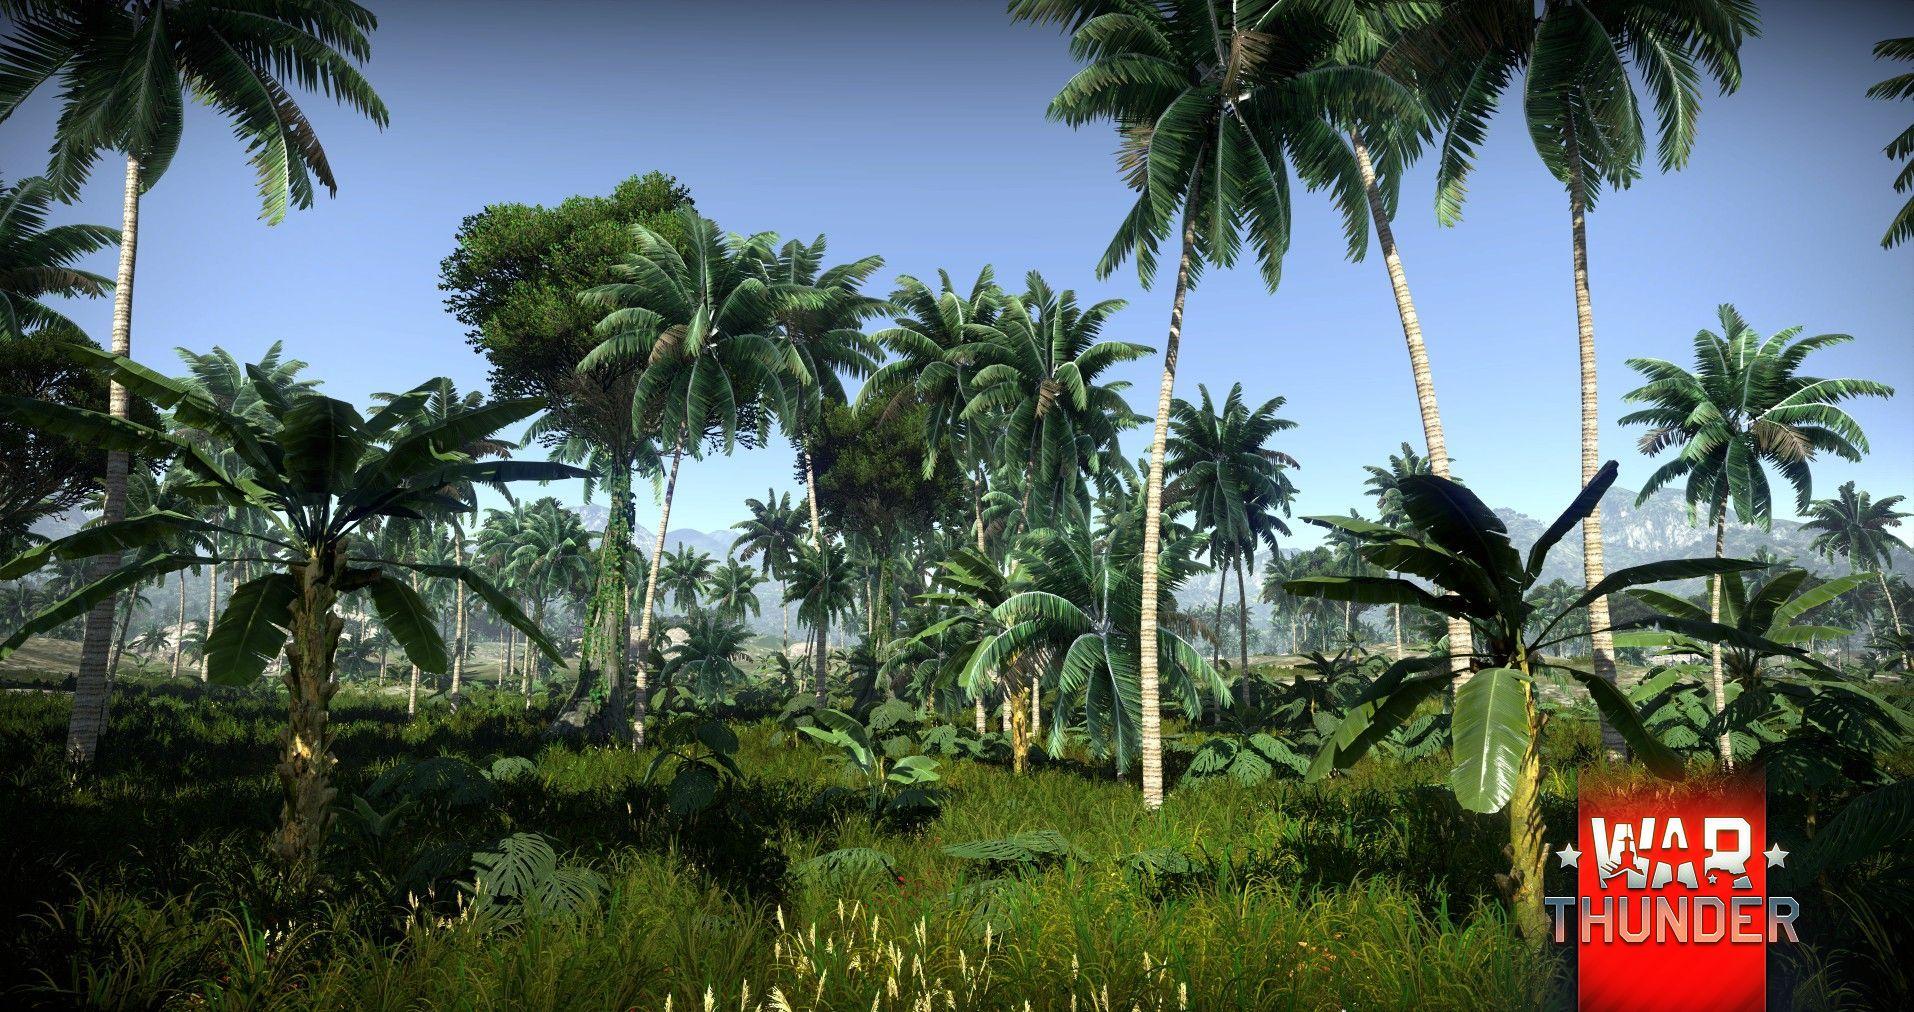 Oct 19, 2015 Sneak Peek: The 'Jungle' in 1 53 War Thunder